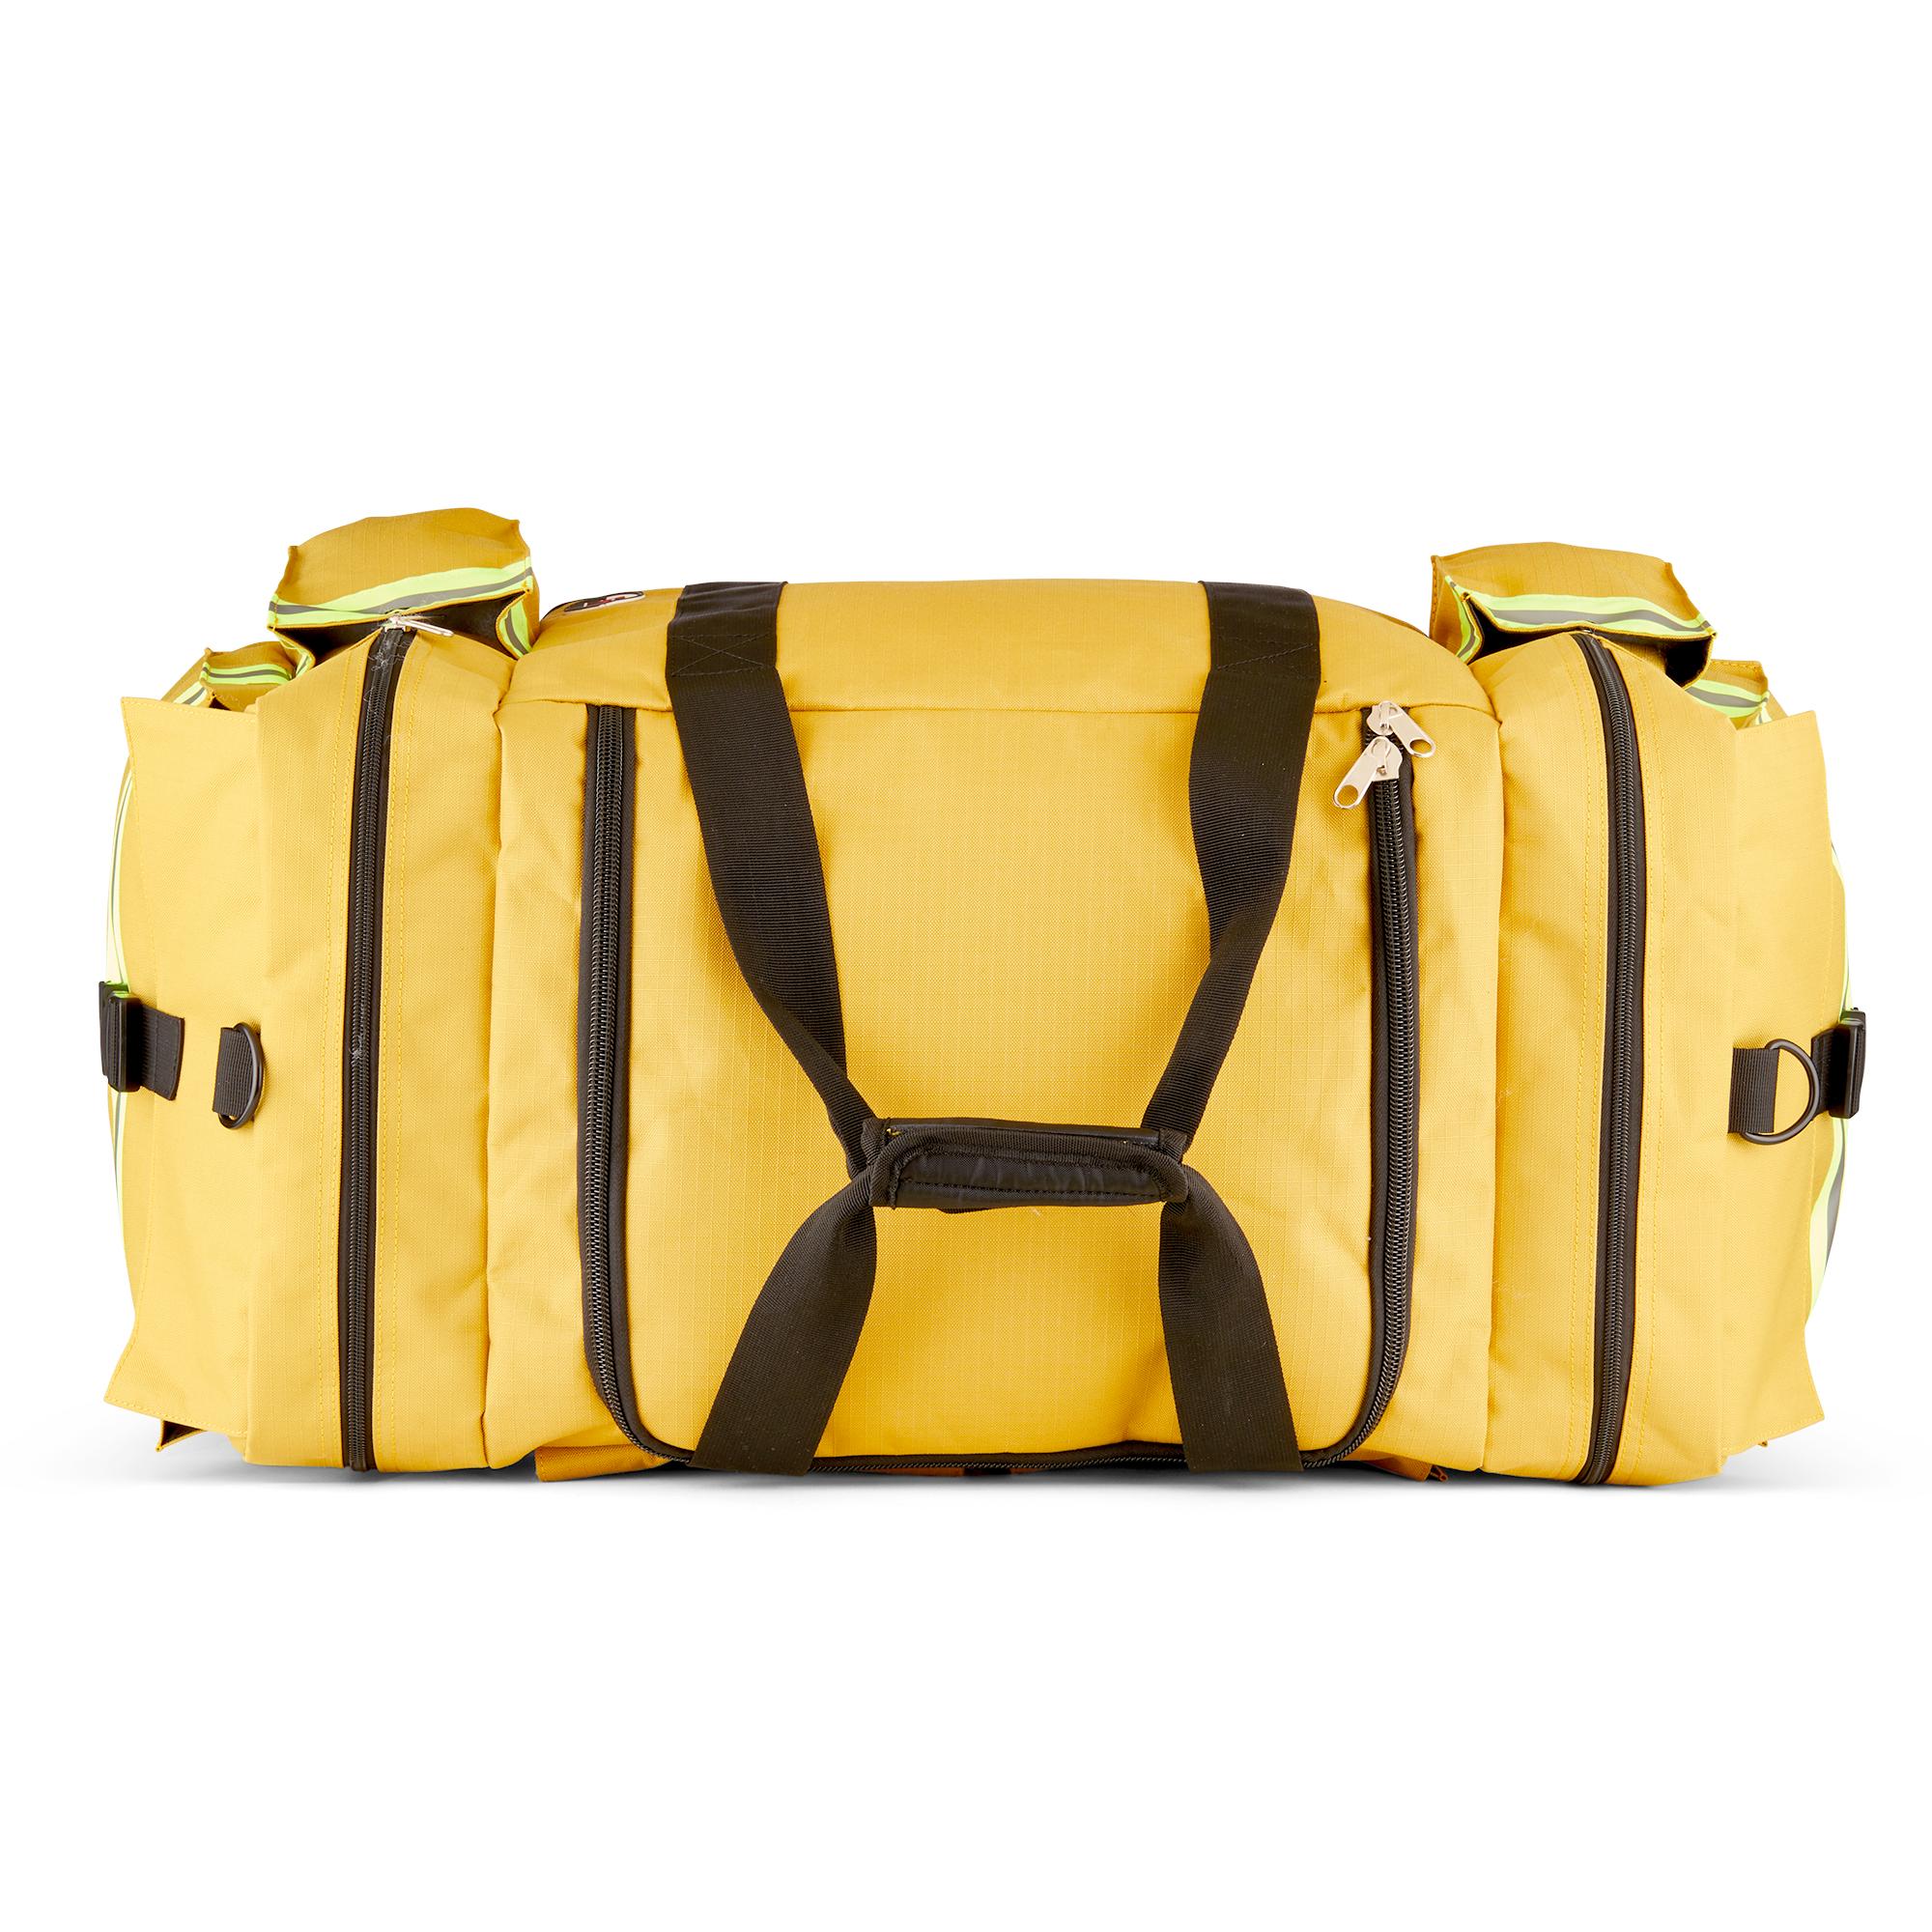 TheFireStore Elite Gear Bag